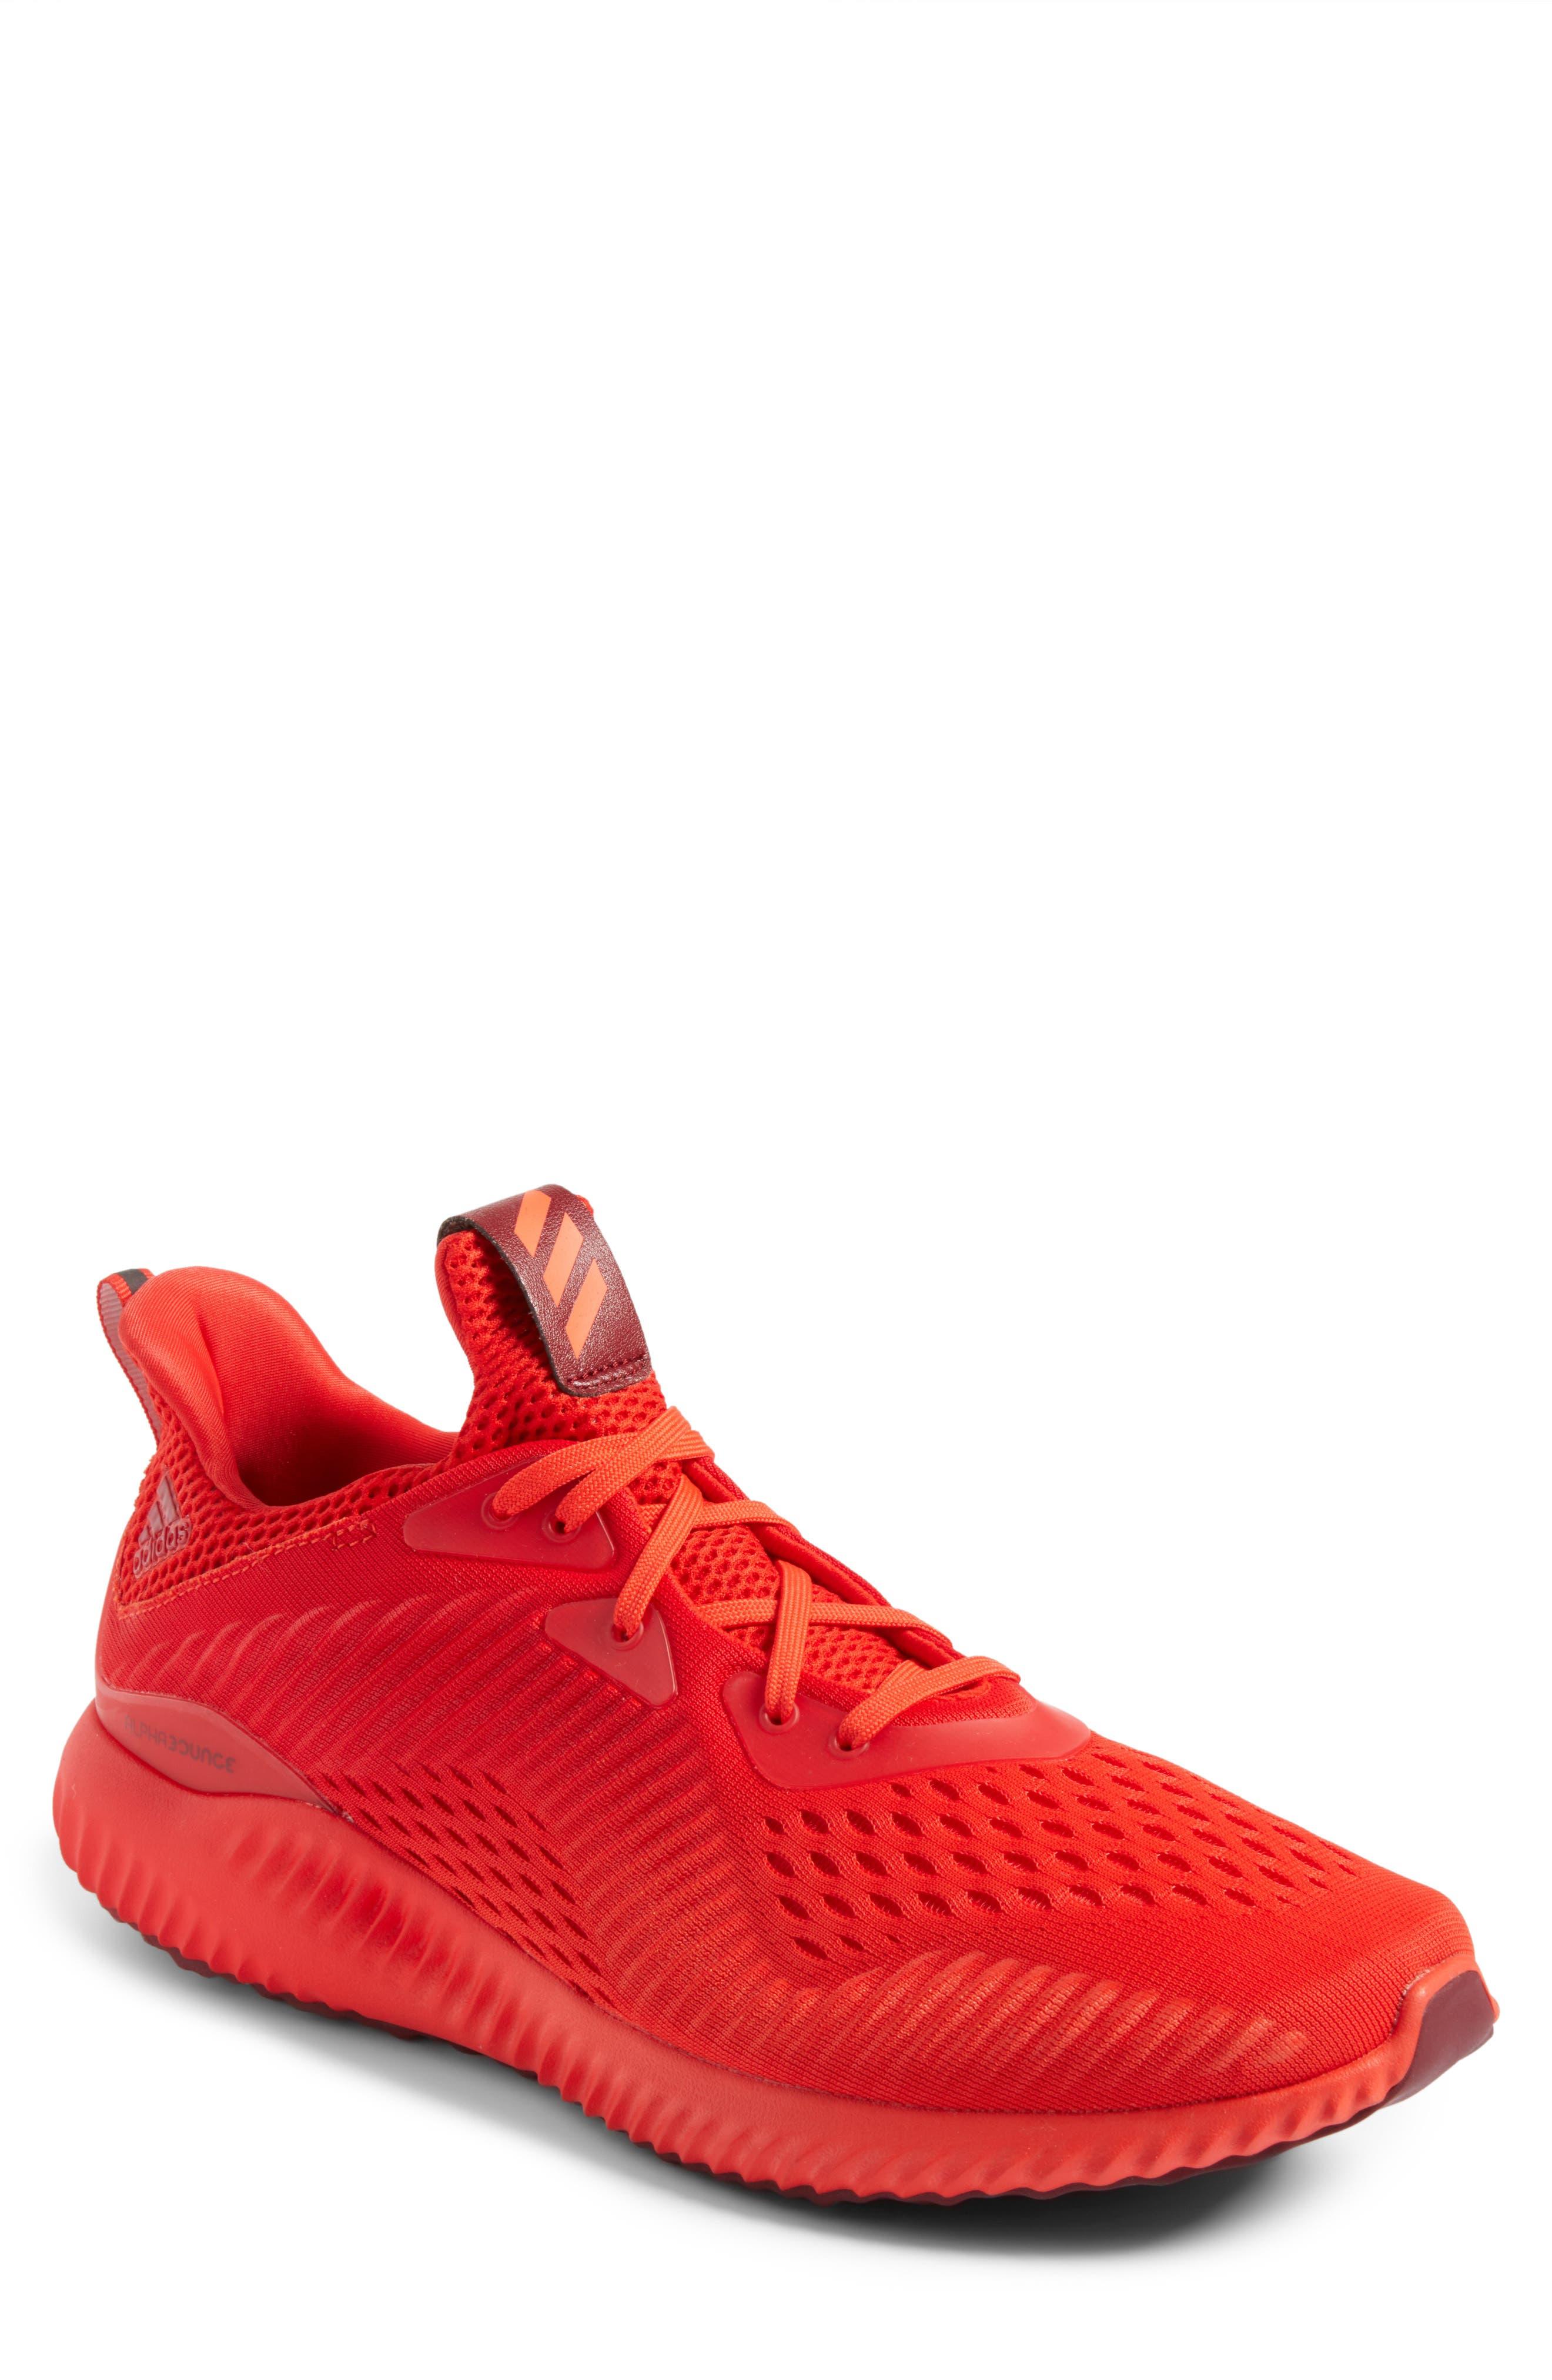 AlphaBounce Running Shoe,                             Main thumbnail 1, color,                             Blaze Orange/Red/Burgundy